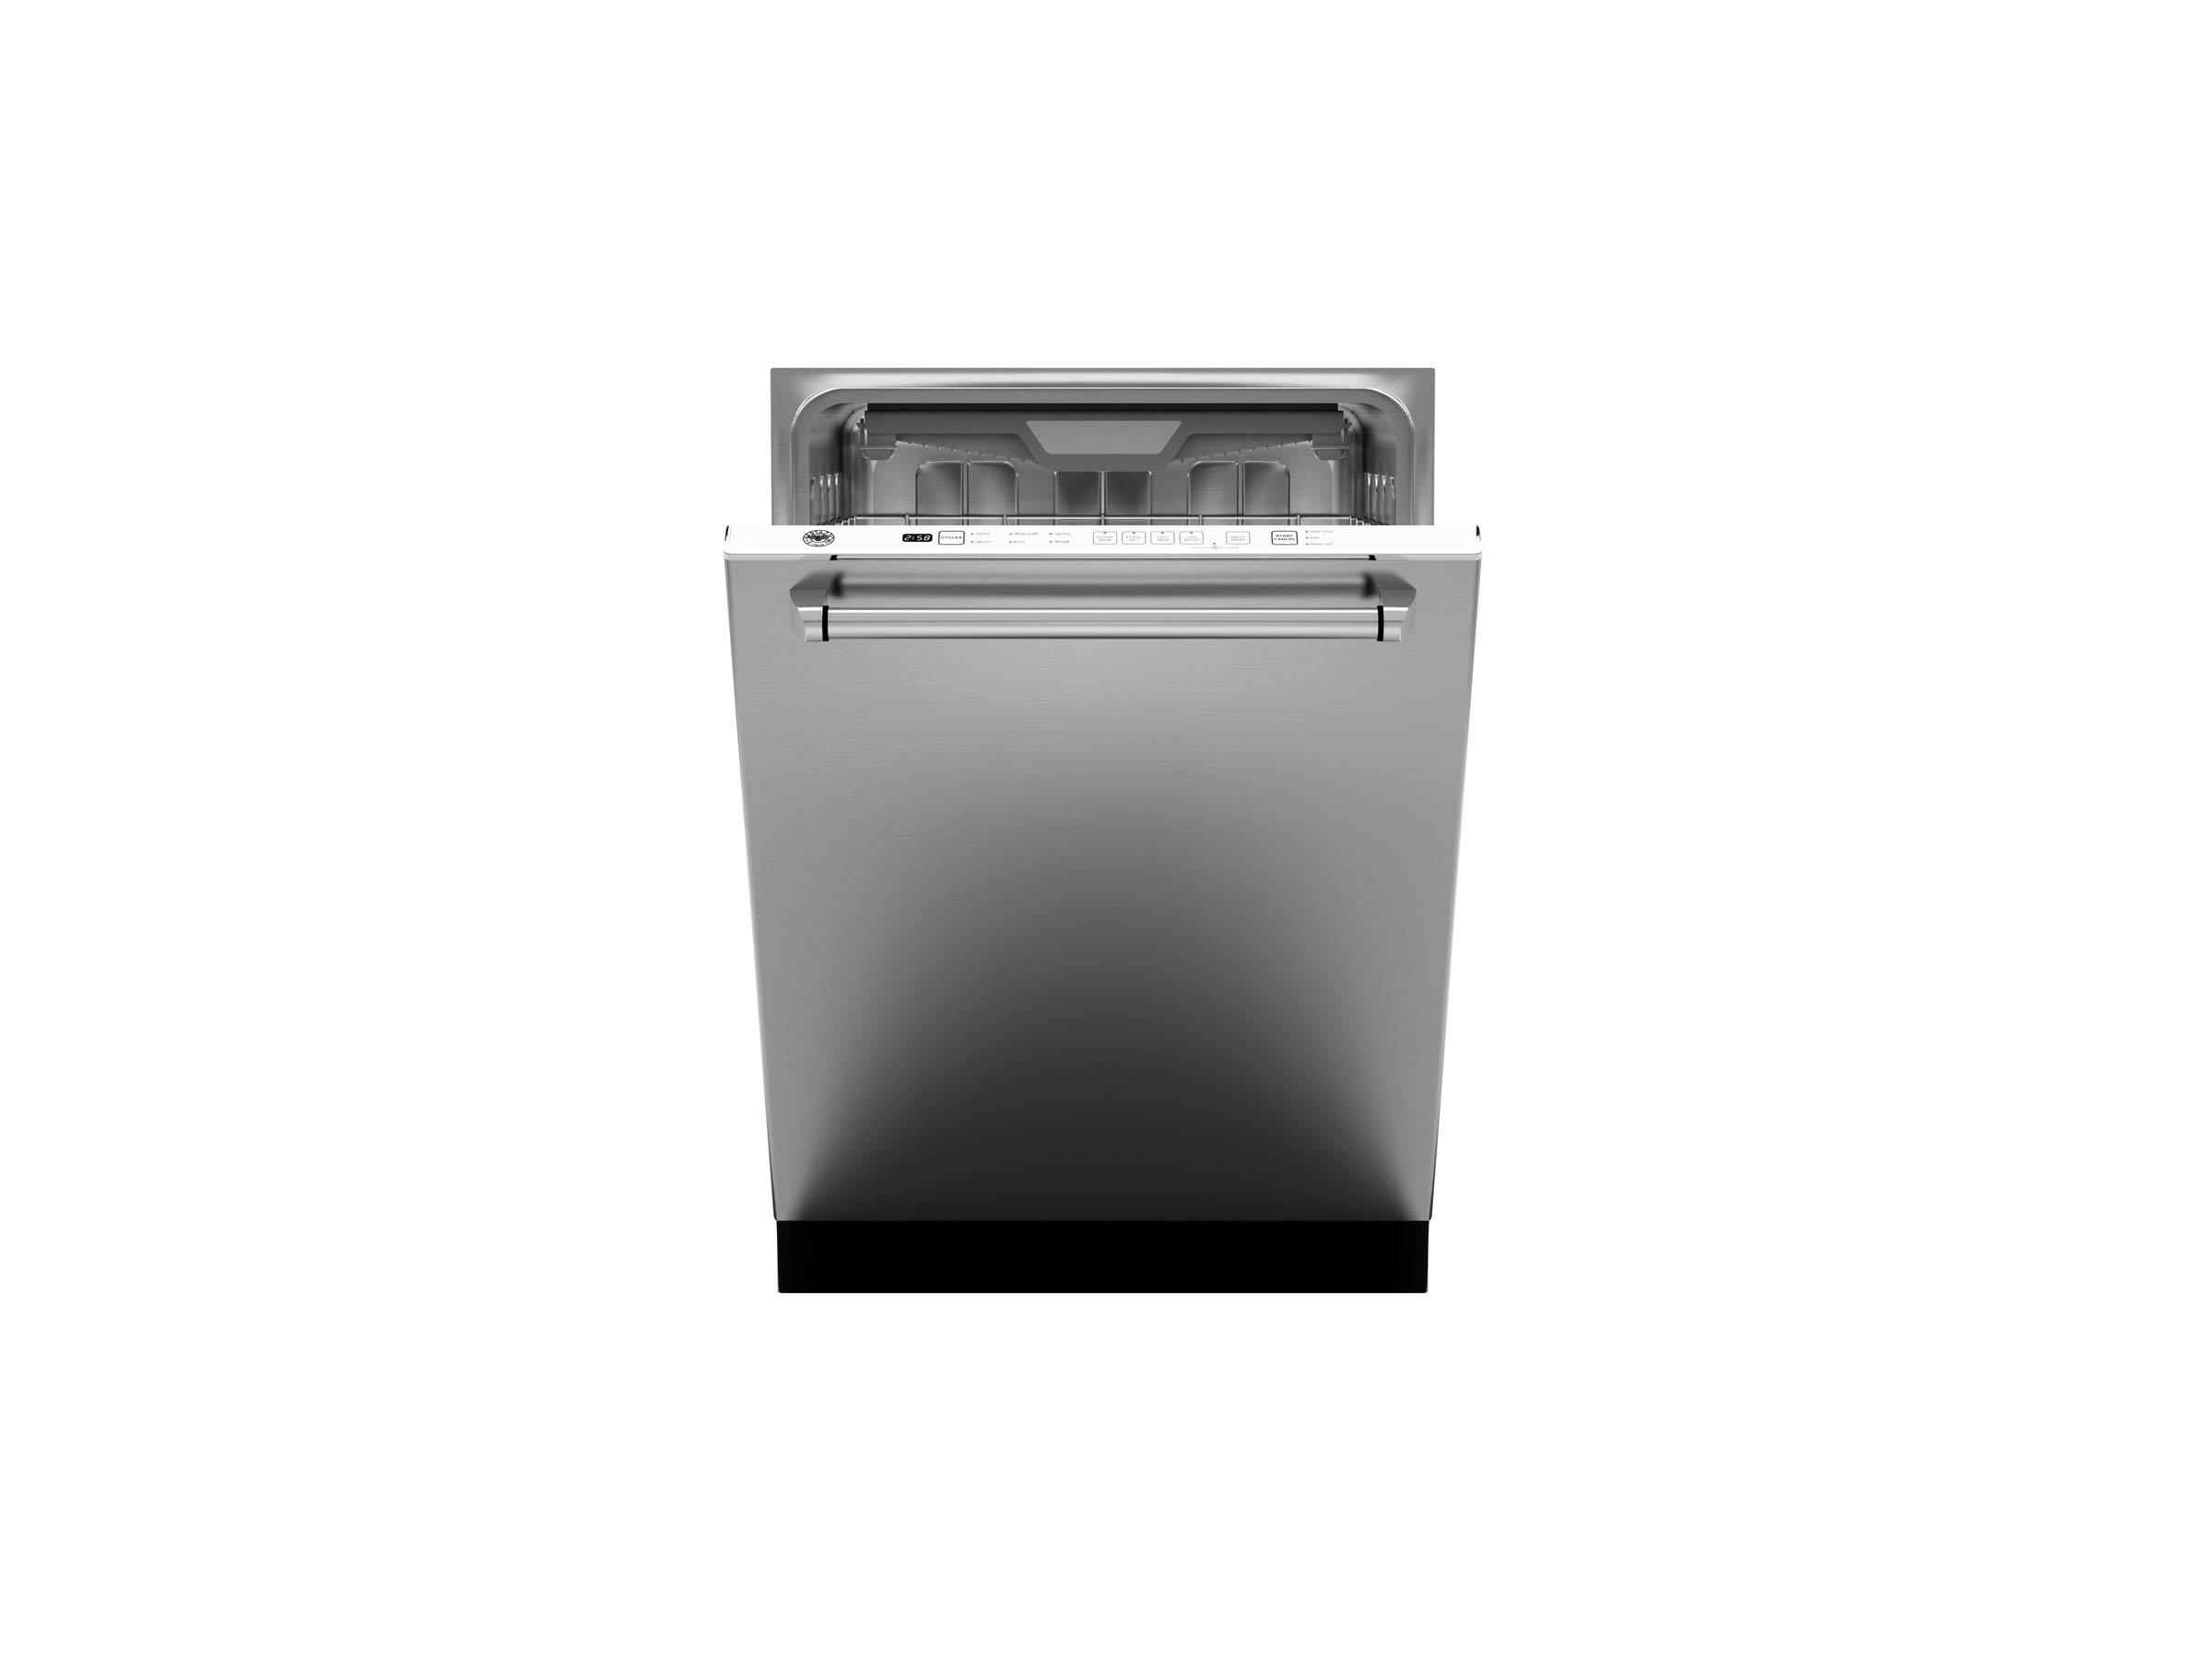 2400x1800 24 Panel Installed Dishwasher 16 Settings 45db Bertazzoni